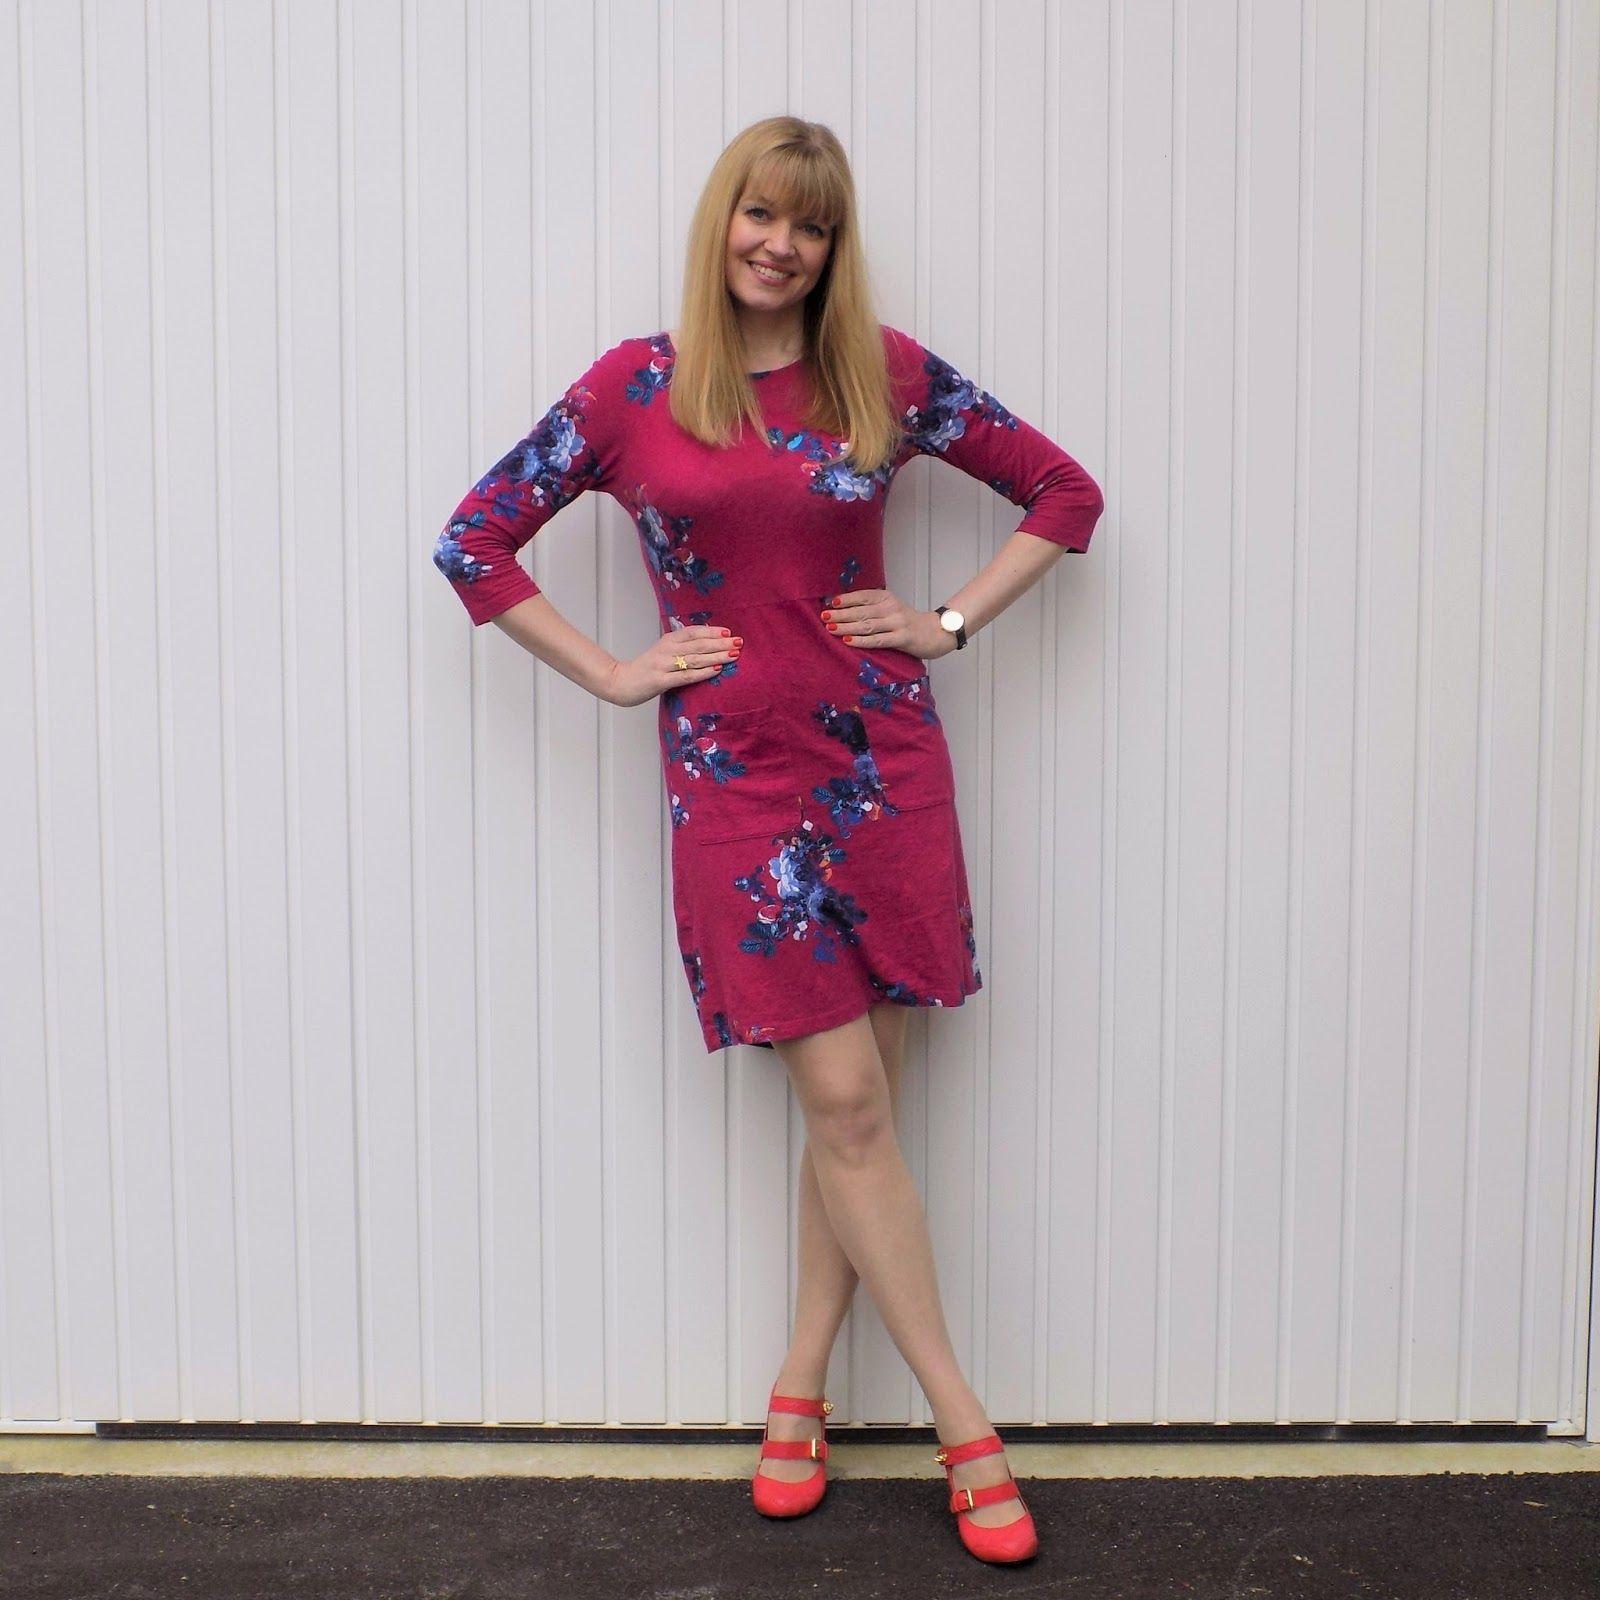 5ba90d839fe2 Bright Pink Floral Dress with Orange Shoes. Pink dress, day dress, smart  dress, jersey dress, bright dress